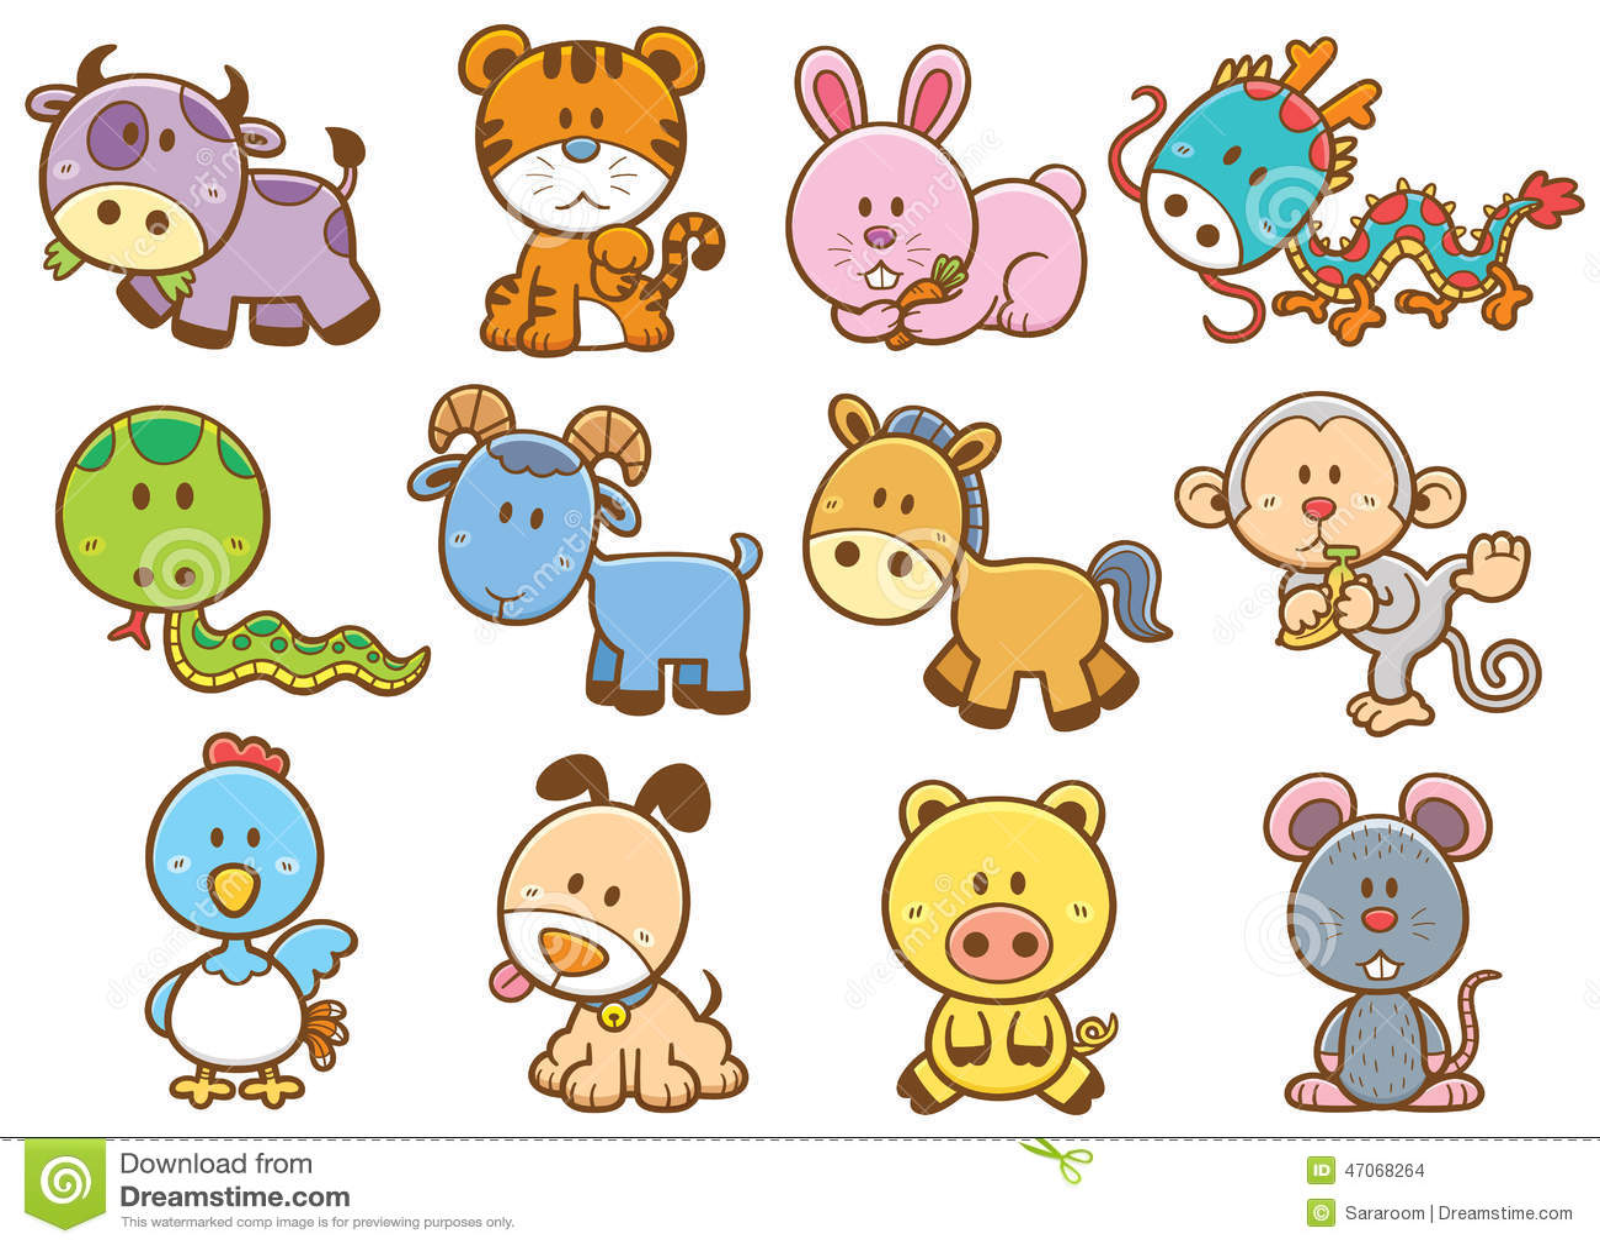 chinese zodiac animals stock vector illustration of rabbit 47068264. Black Bedroom Furniture Sets. Home Design Ideas